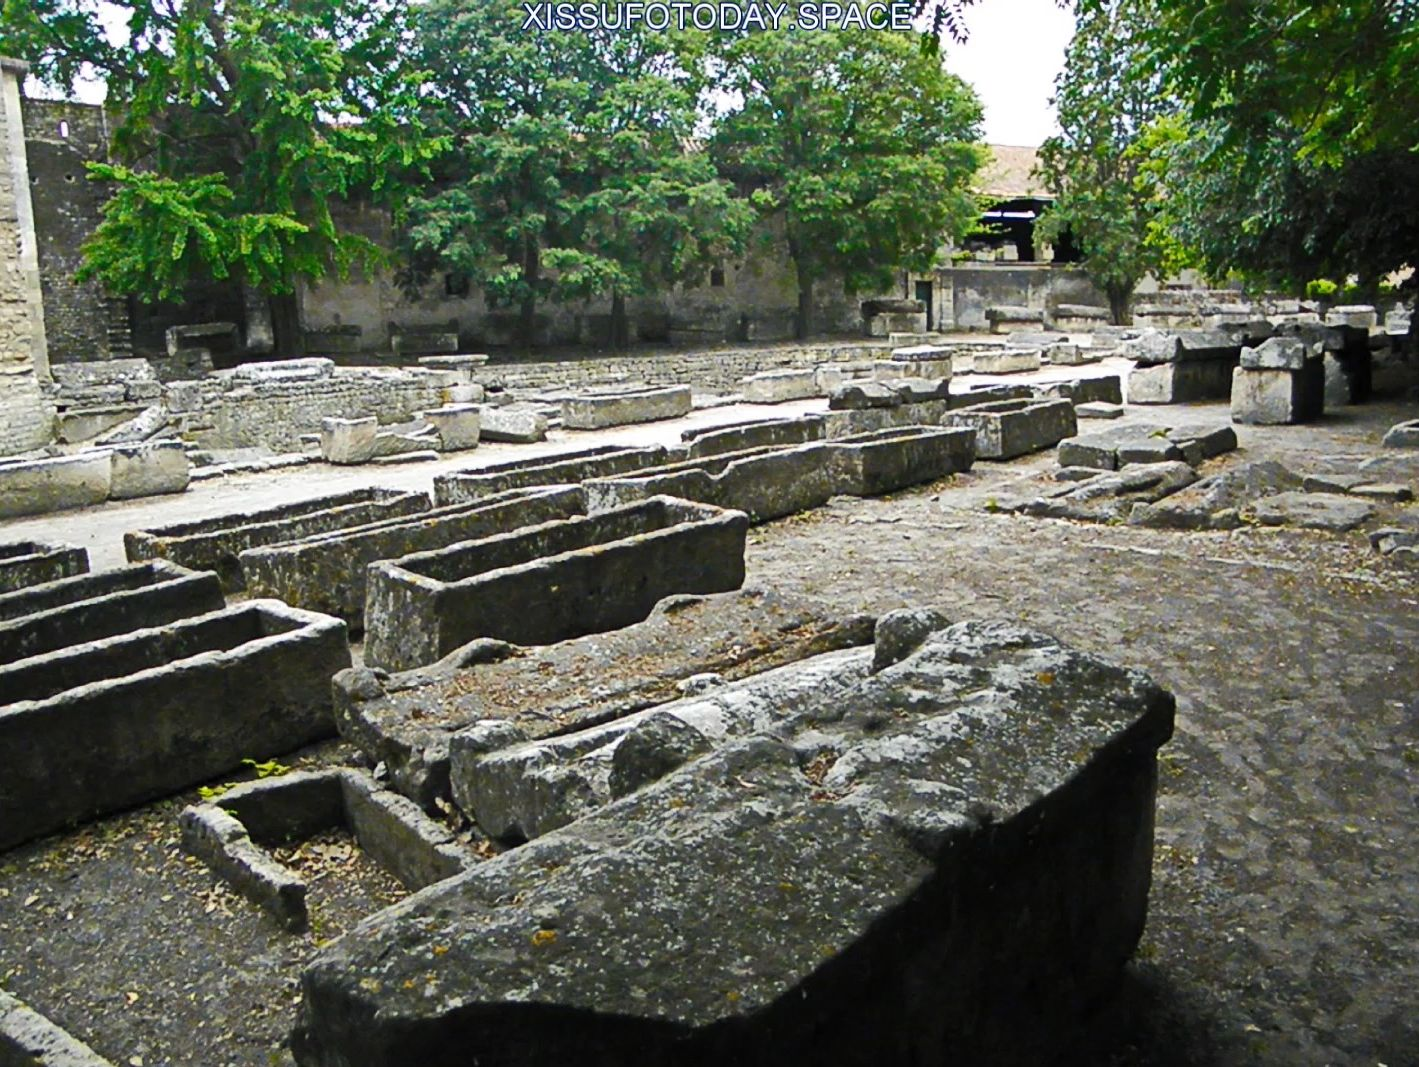 Stone coffins